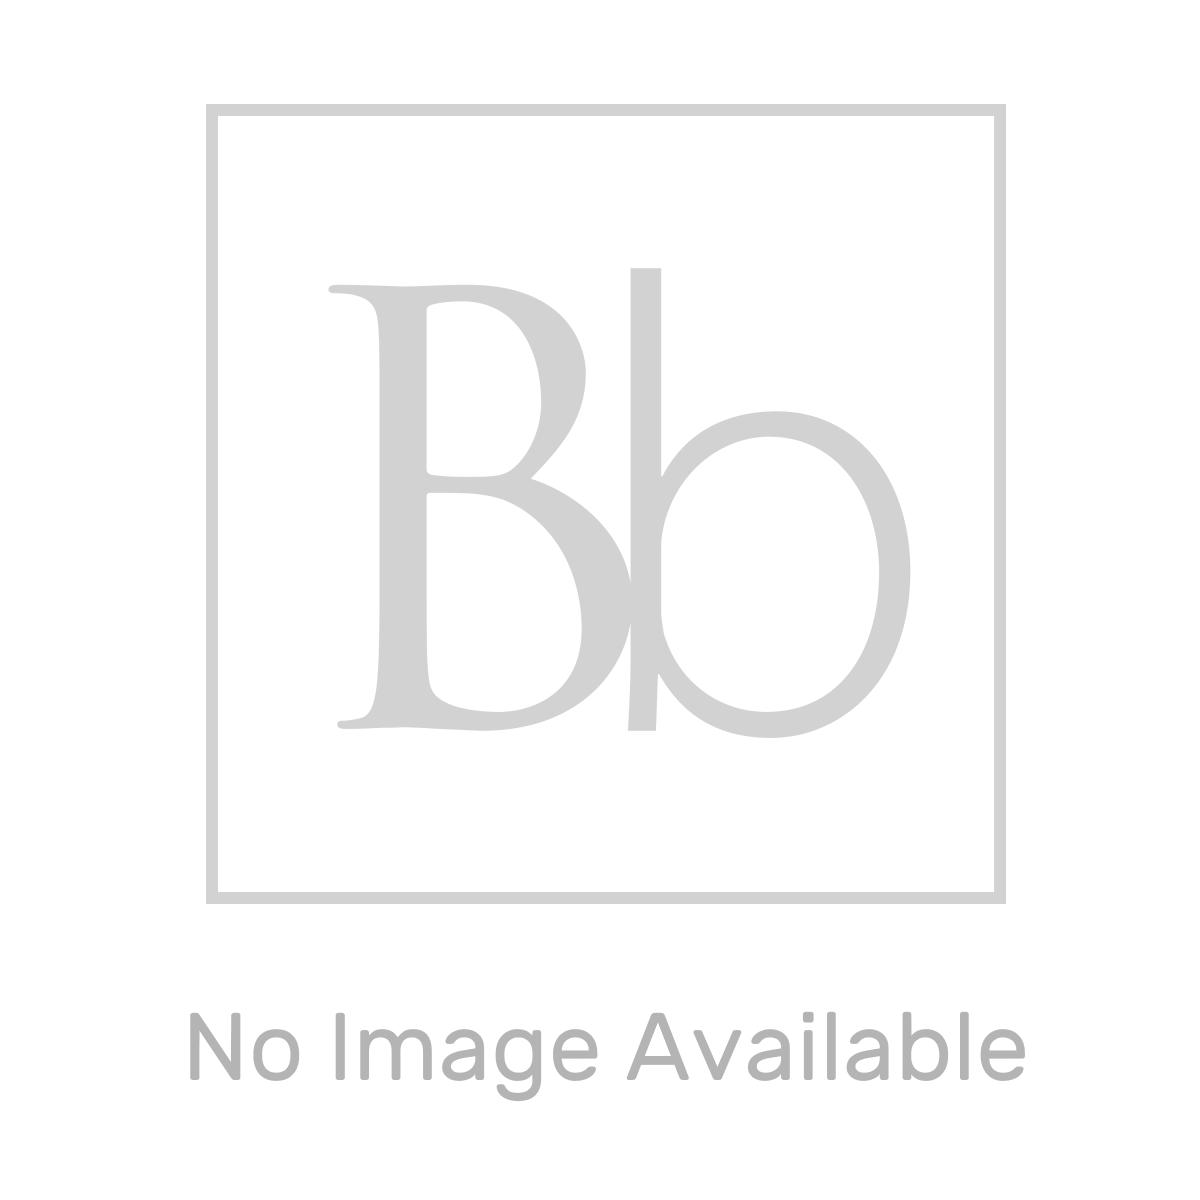 Elation Ikoma Pearl Grey Matt 4 Drawer Unit Dimensions